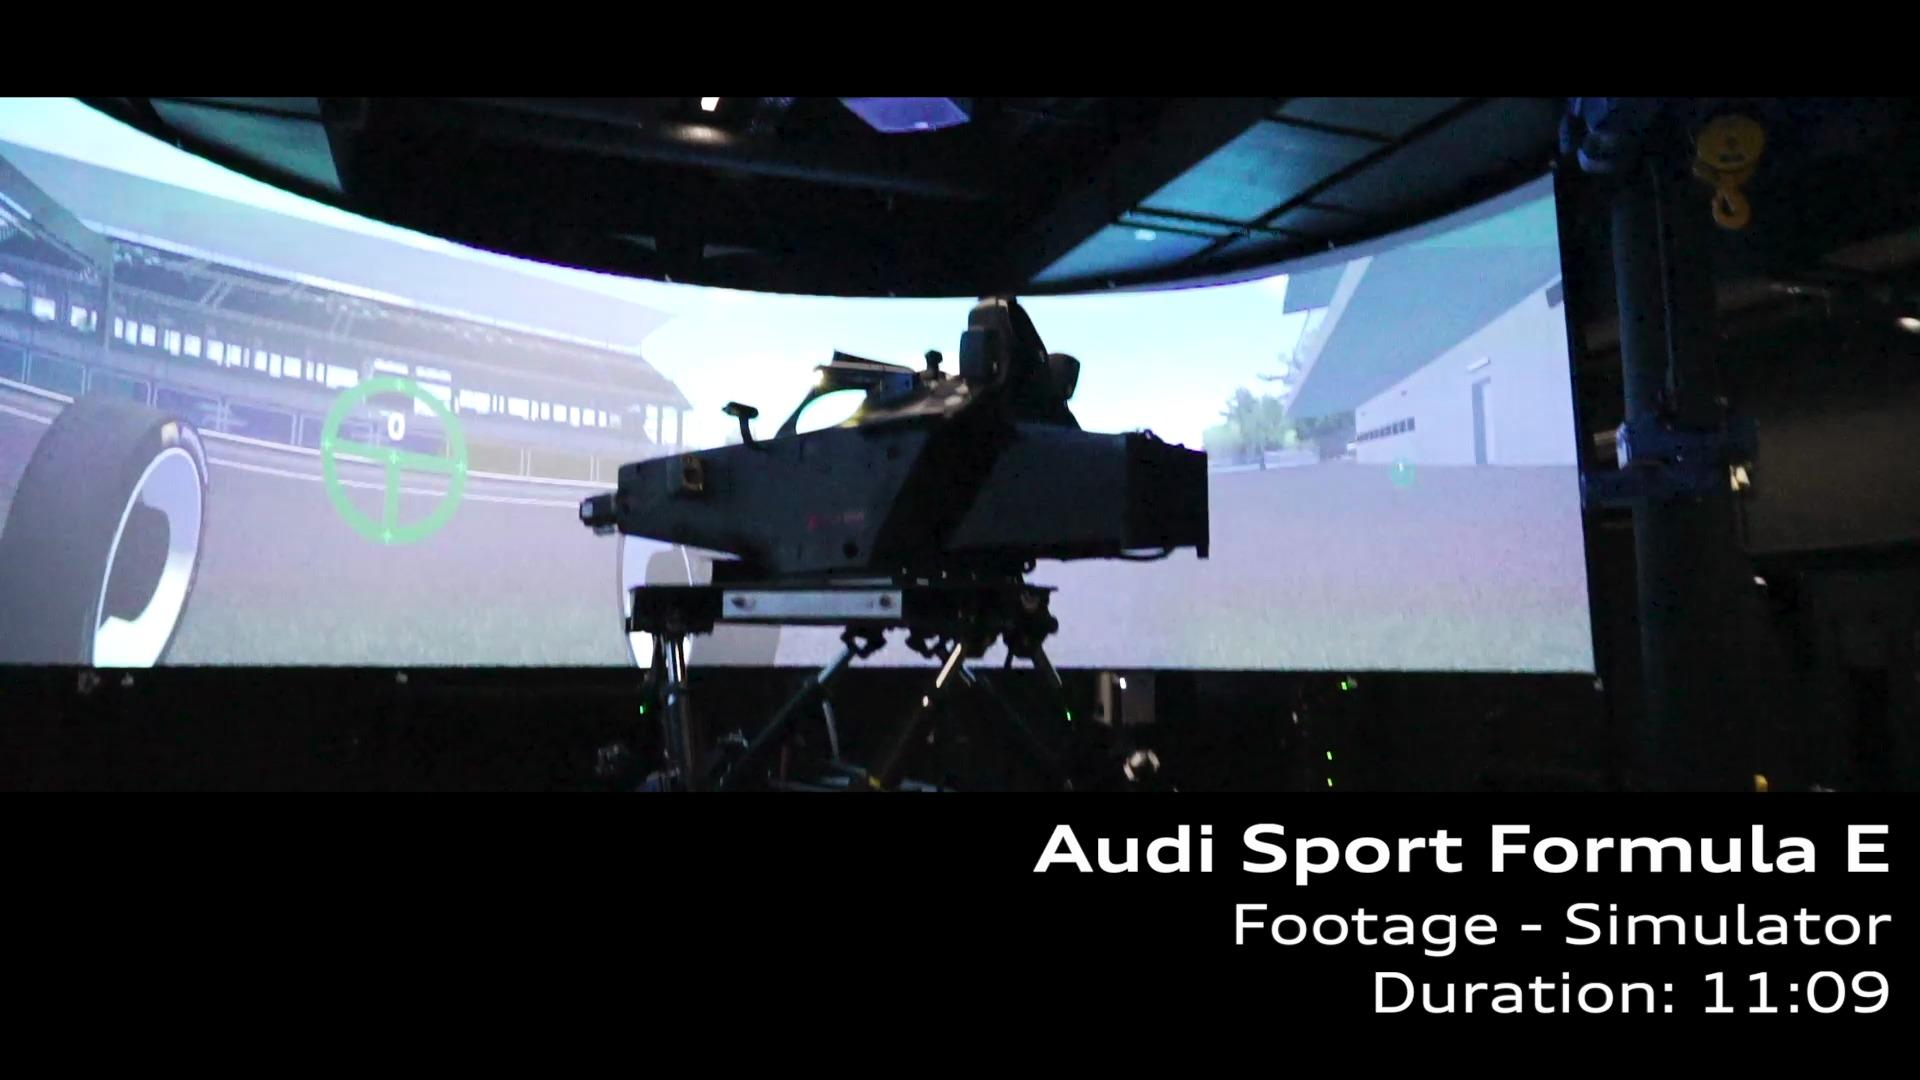 Footage: Audi Sport Formel E Simulator Neuburg